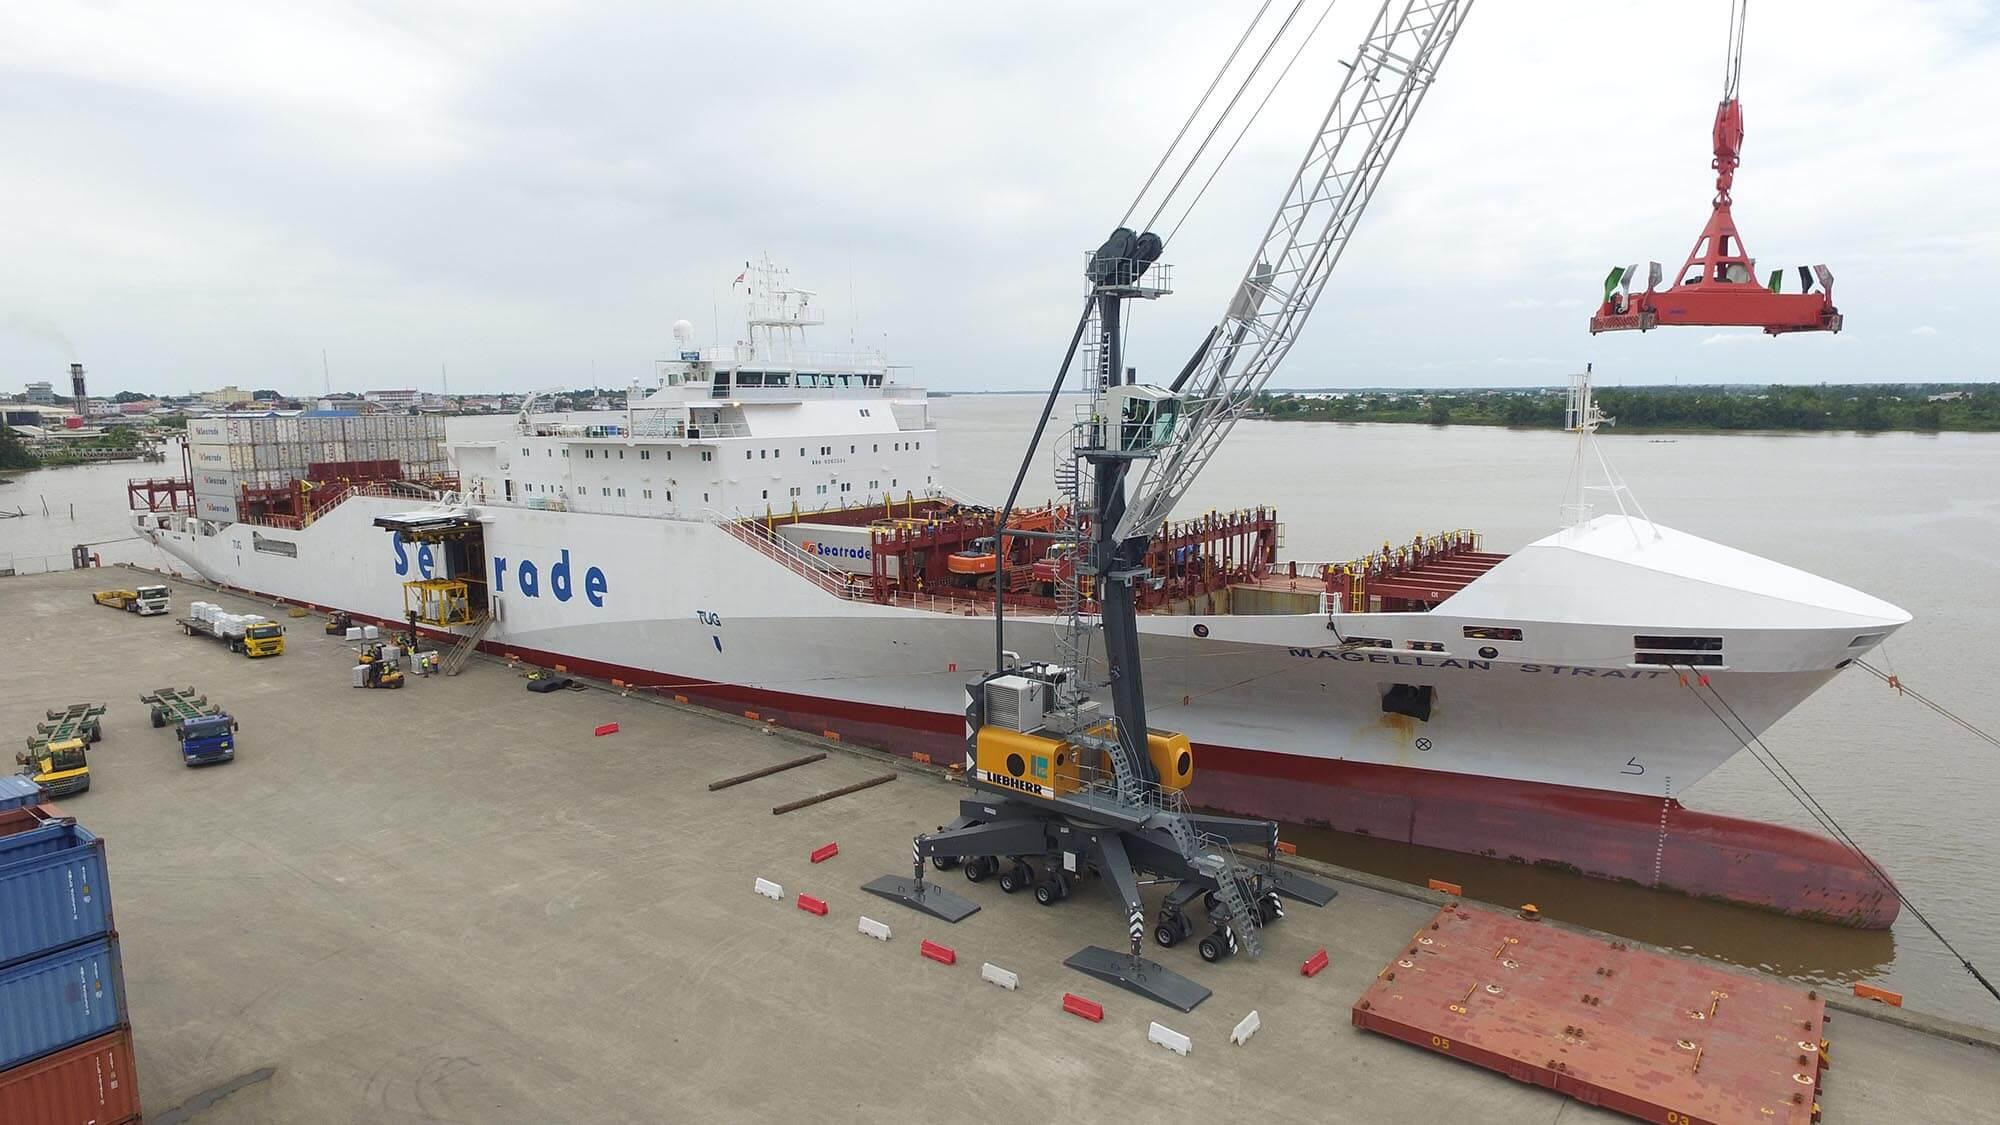 VSH Transport operates a multi cargo terminal in Suriname